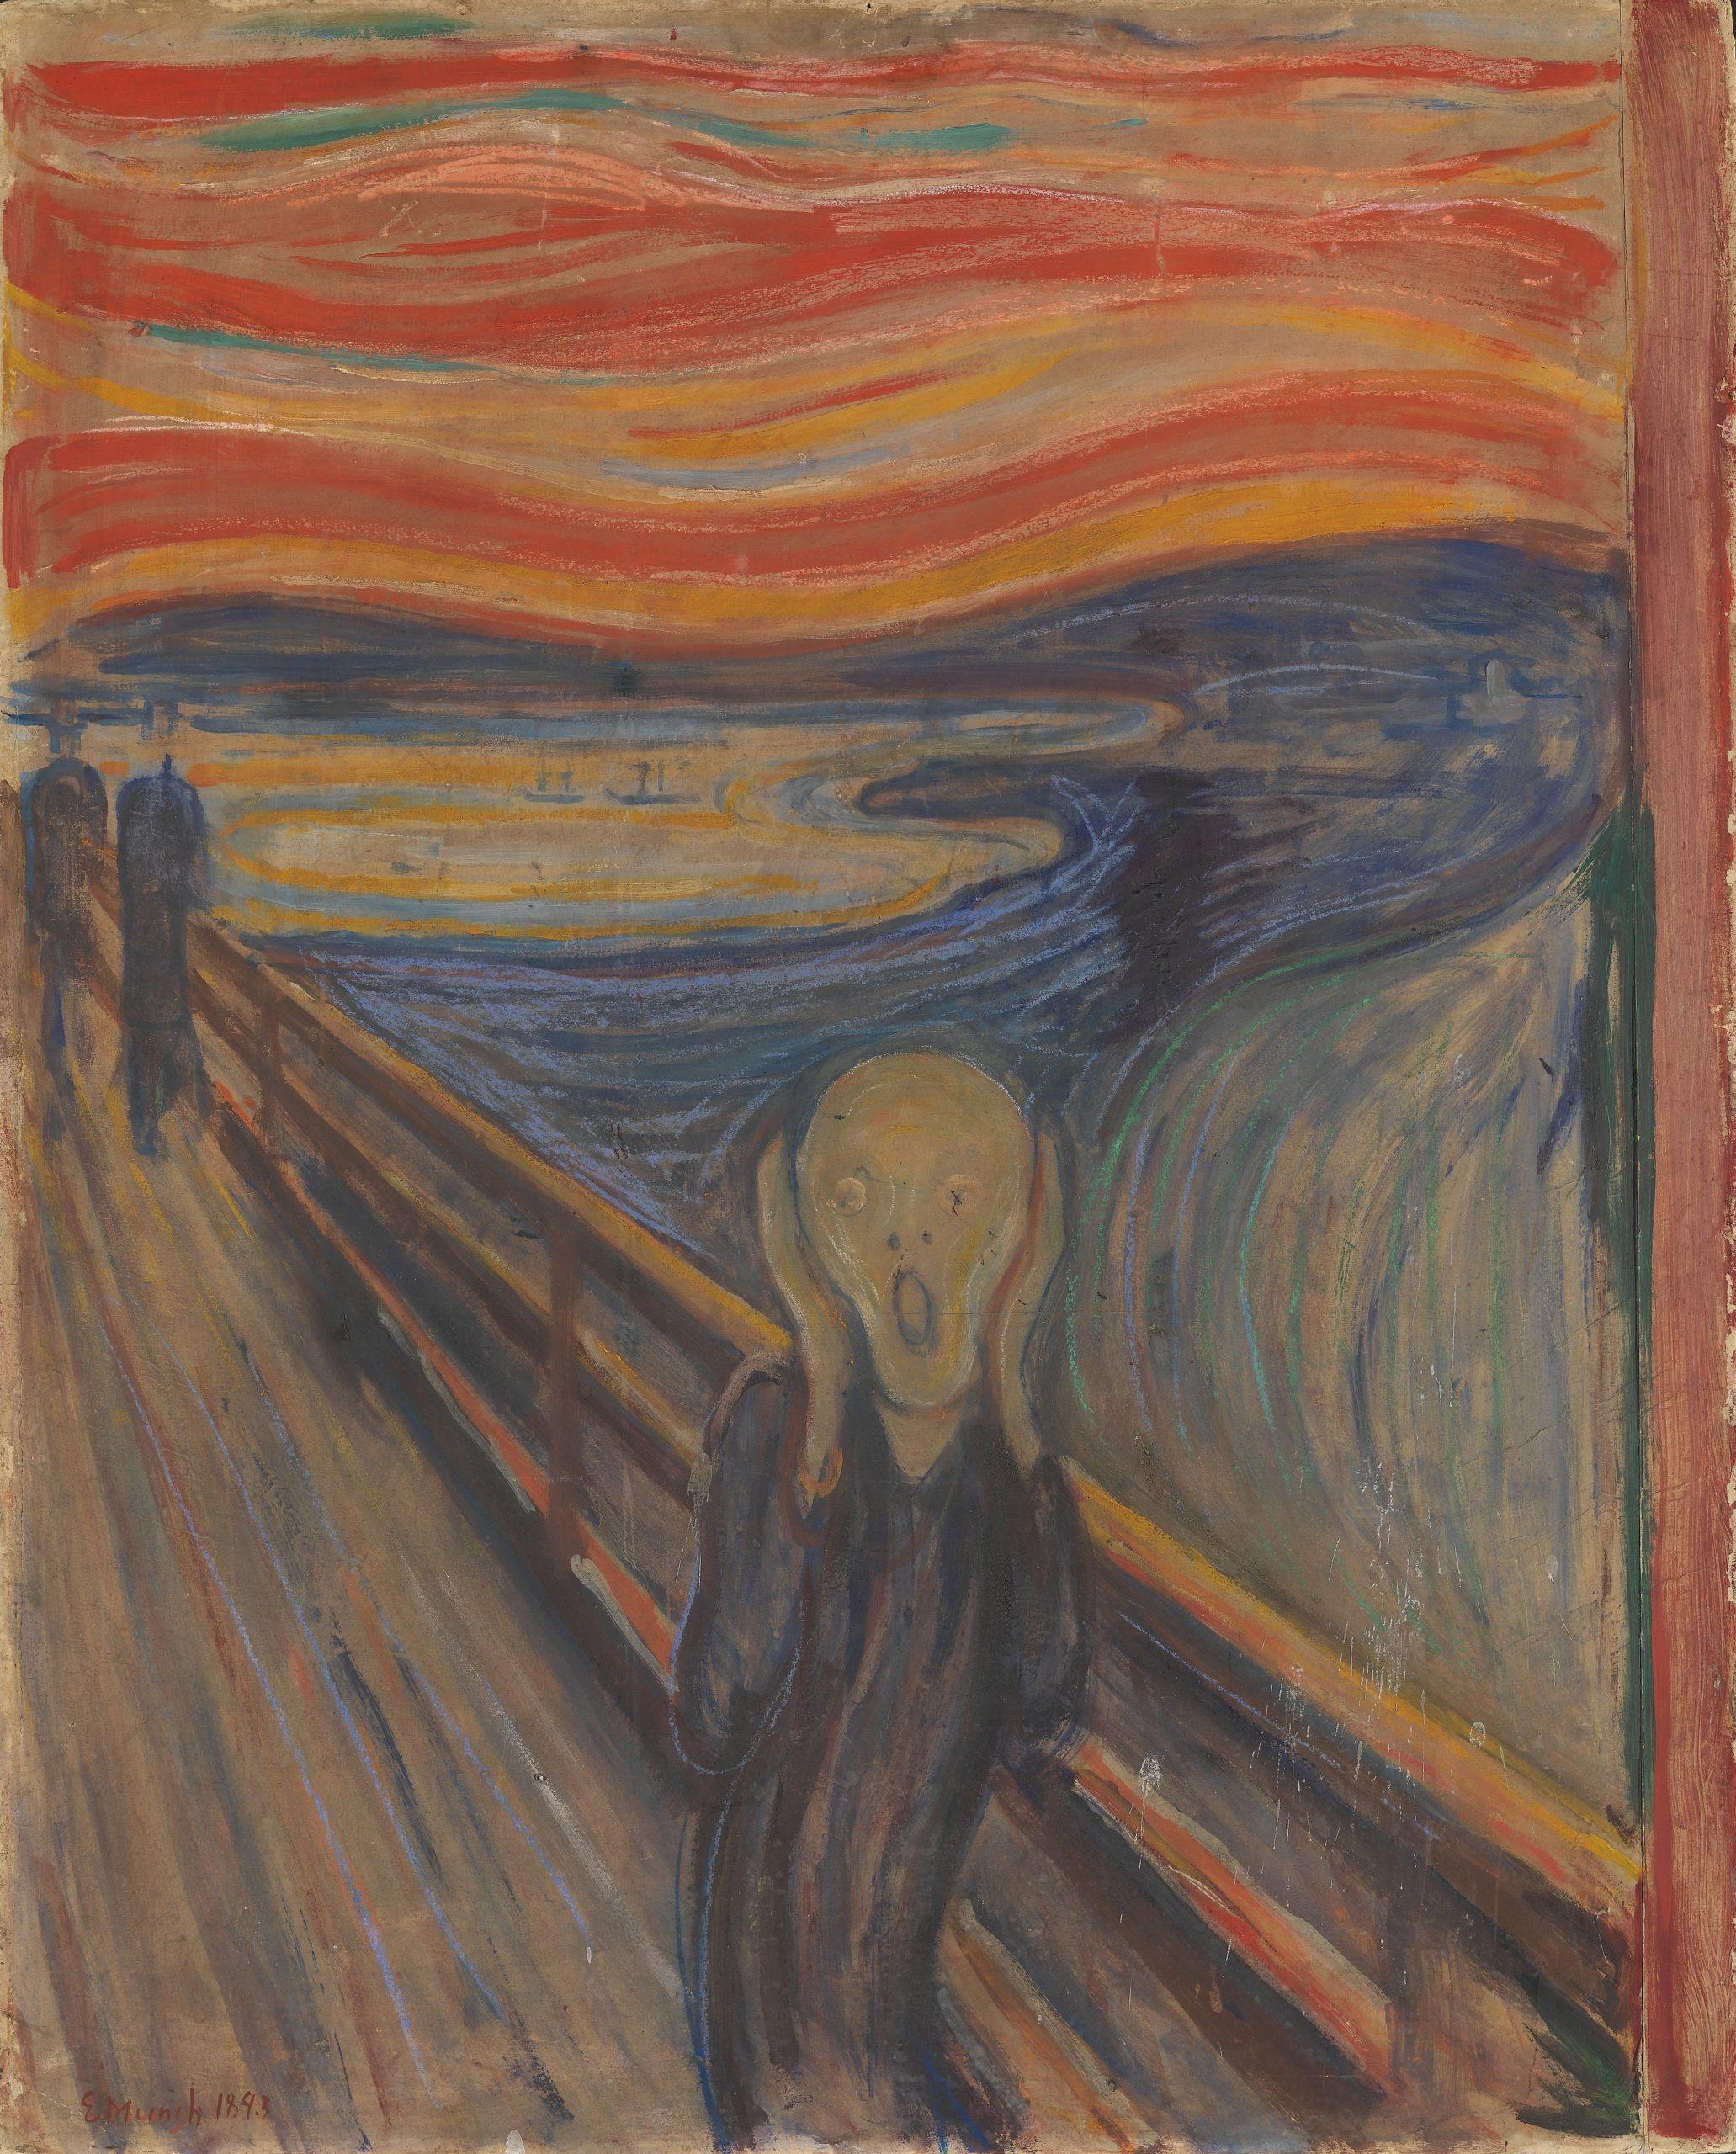 Edvard Munch - Le Cri (1893)